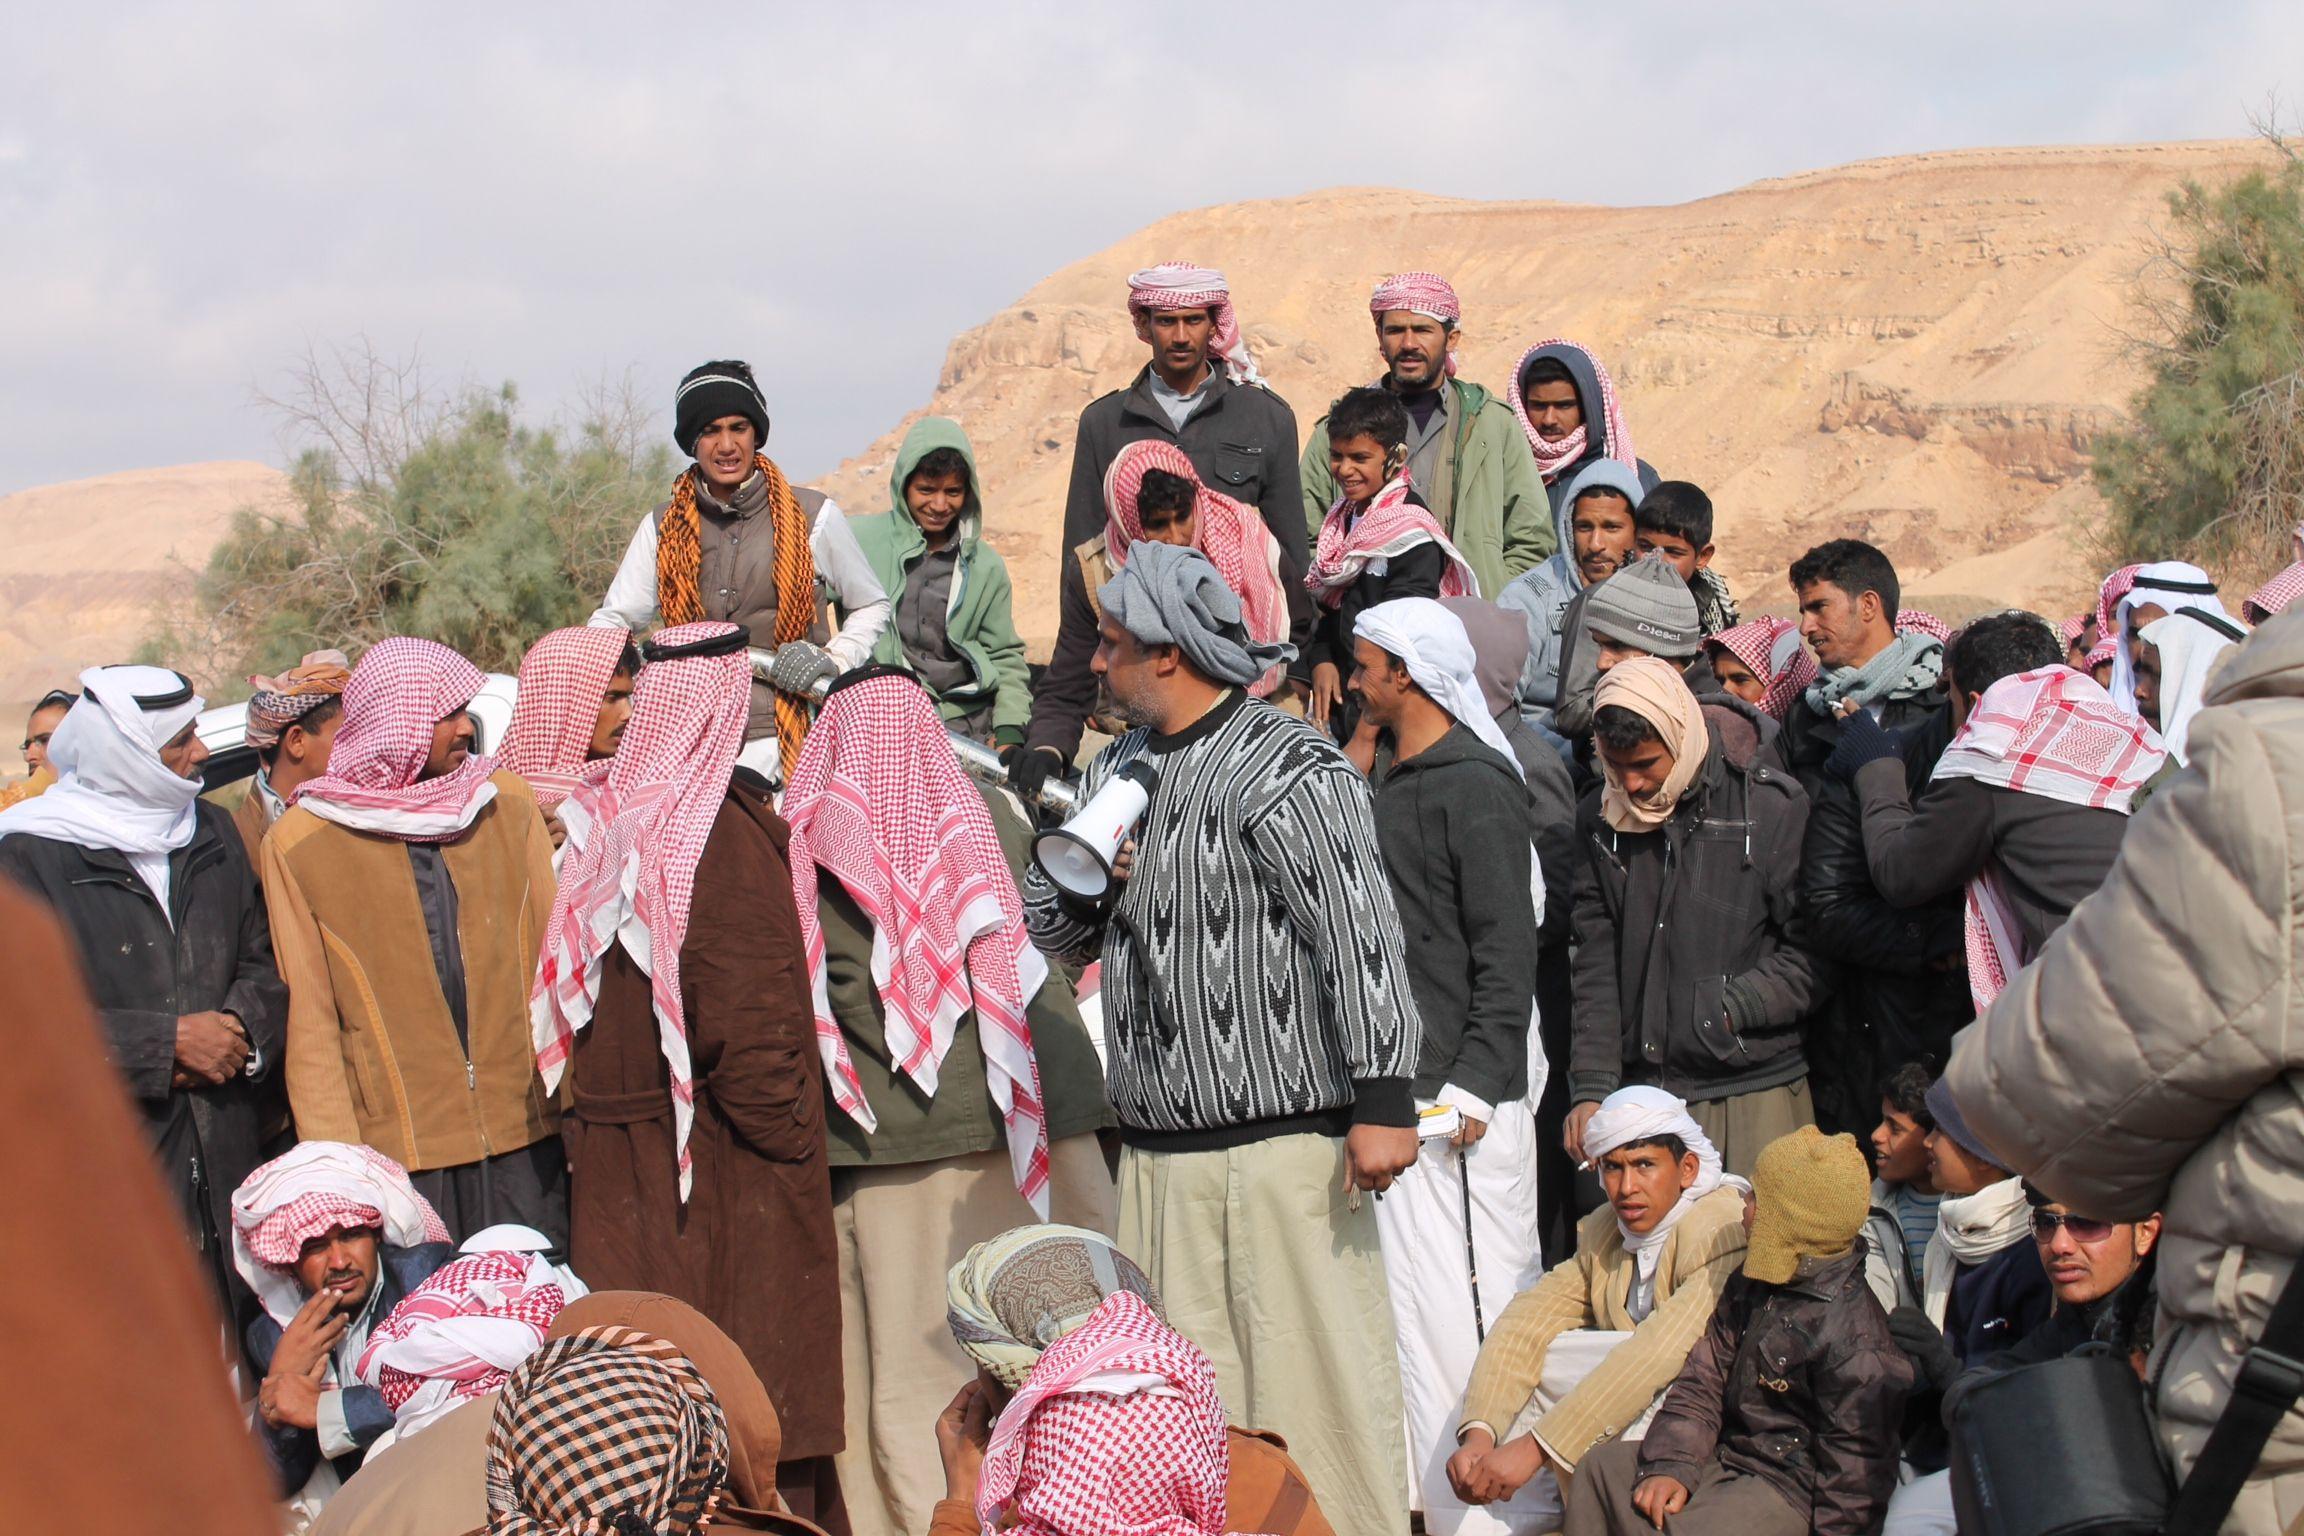 #Sinai desert #bedouin culture #nomad #camel rase